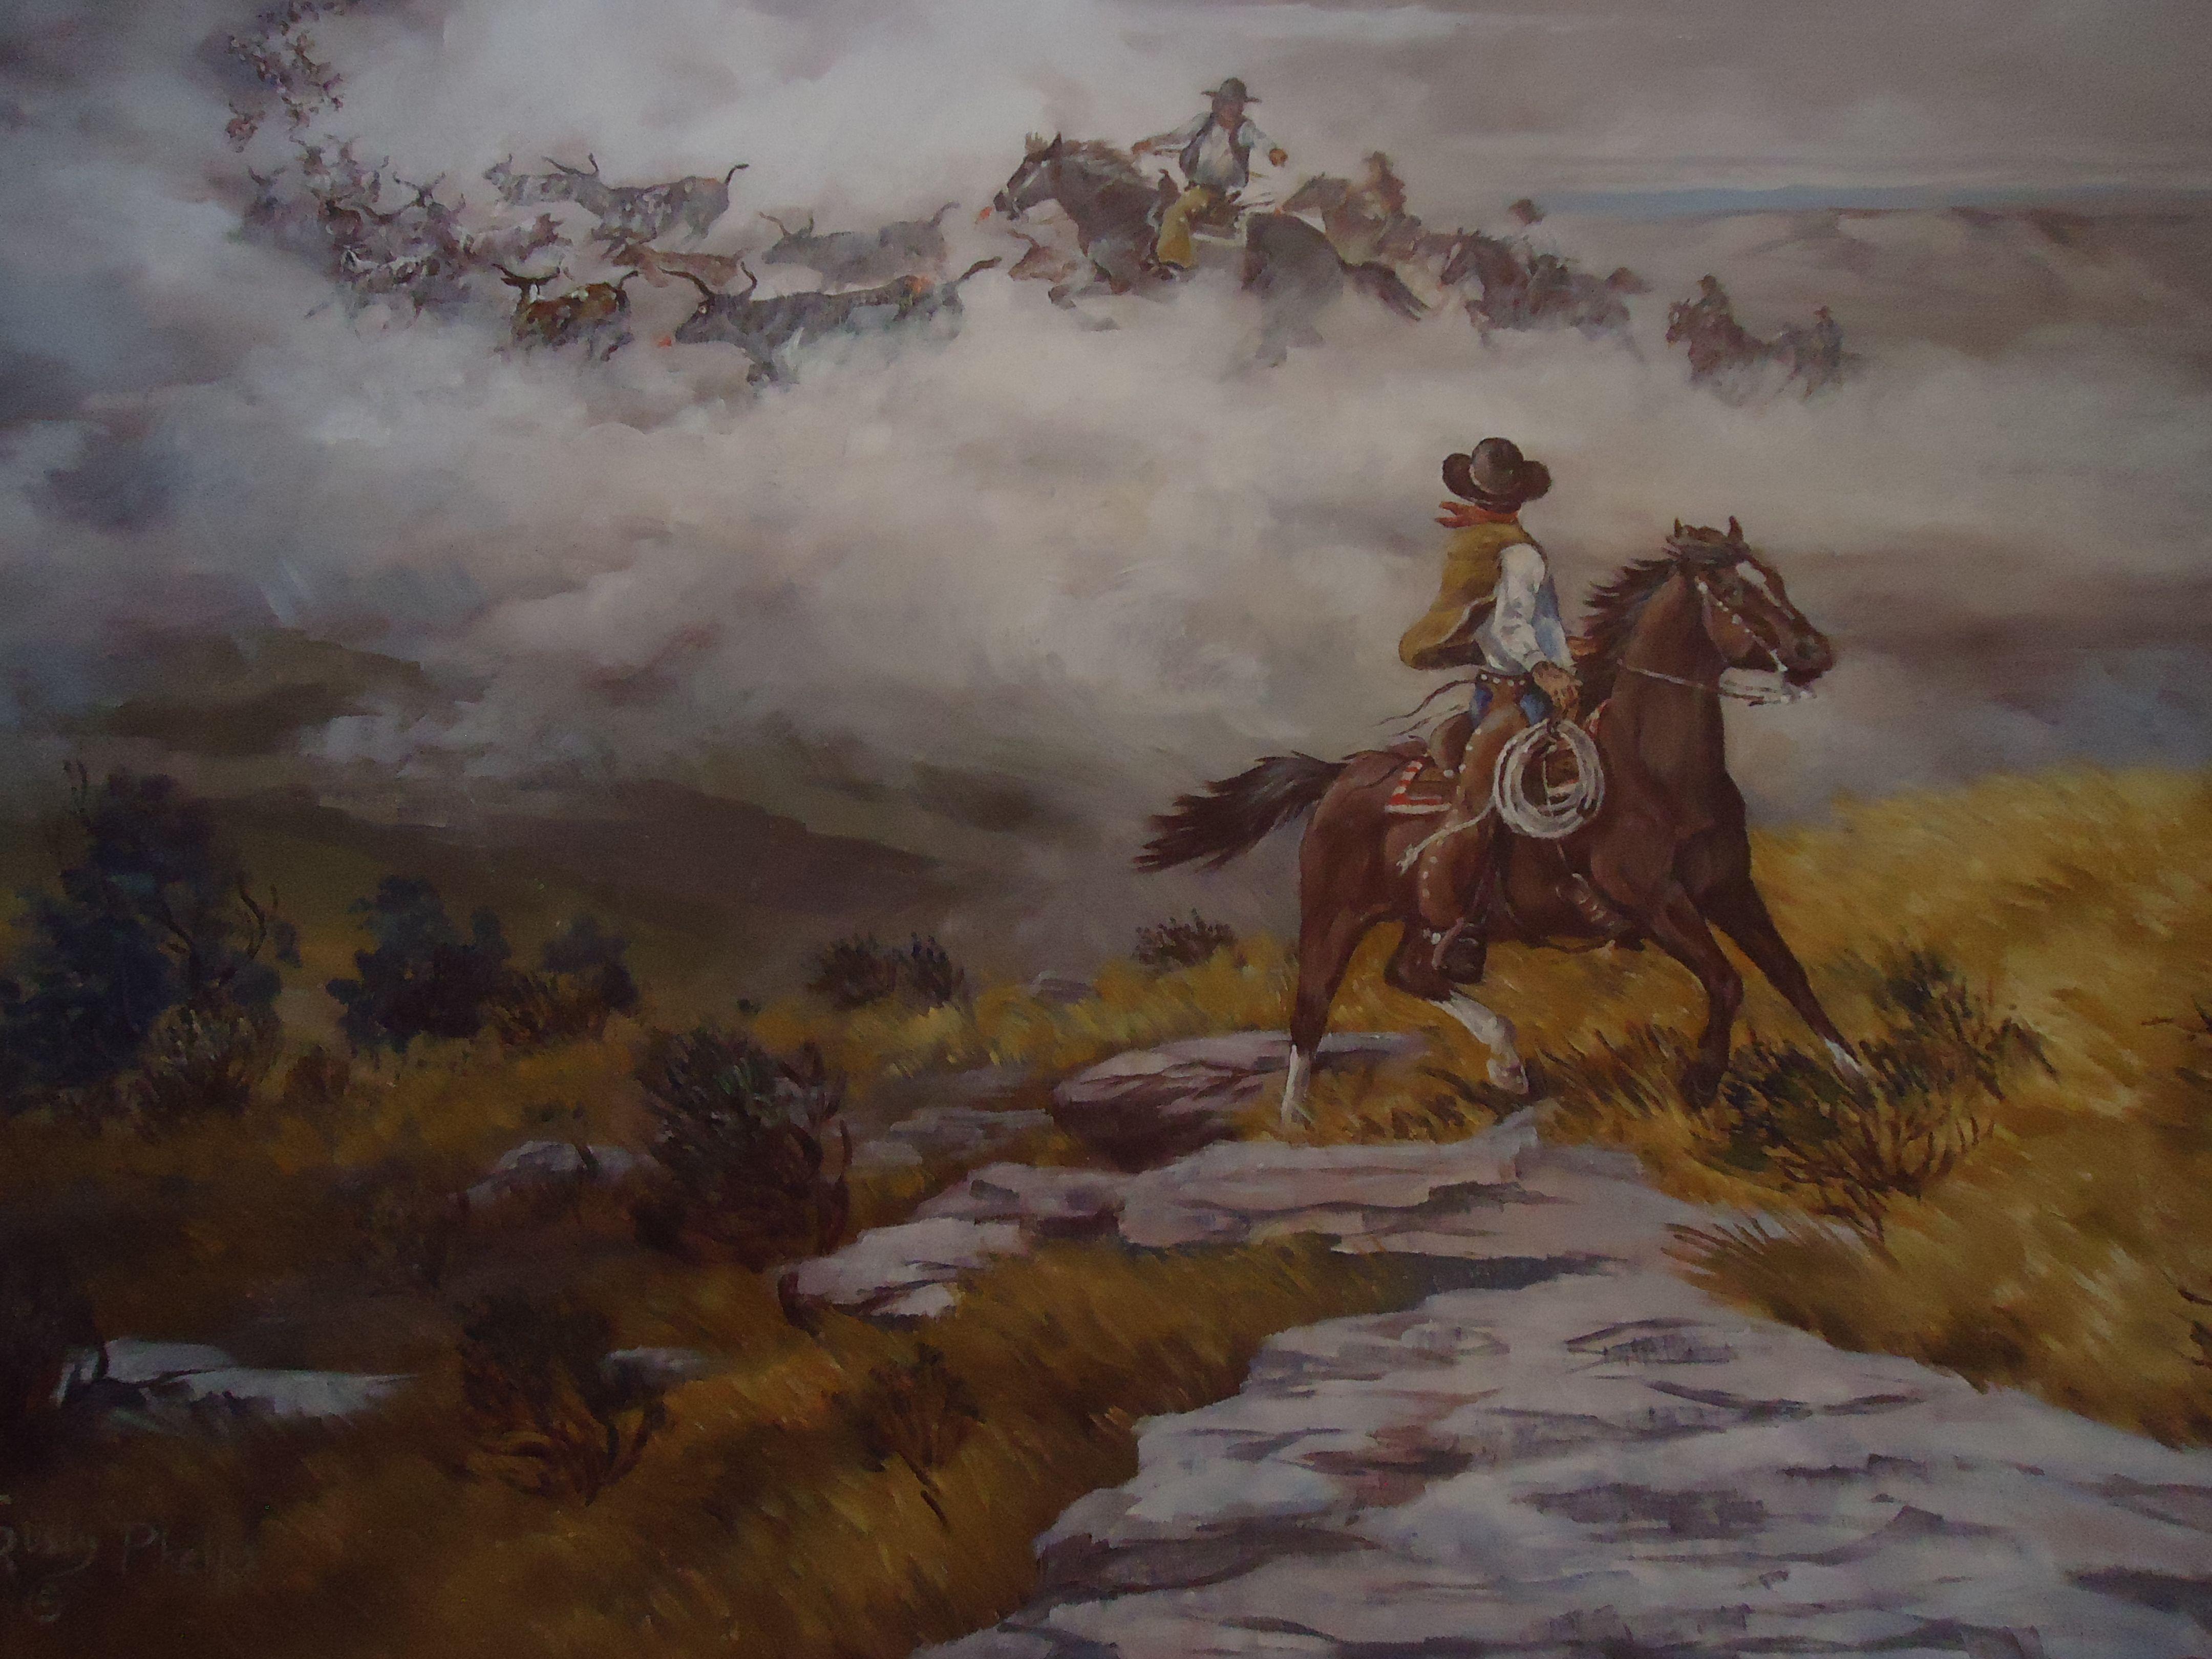 Ghost Riders in the Sky | Ghost rider, Western art, Cowboy art